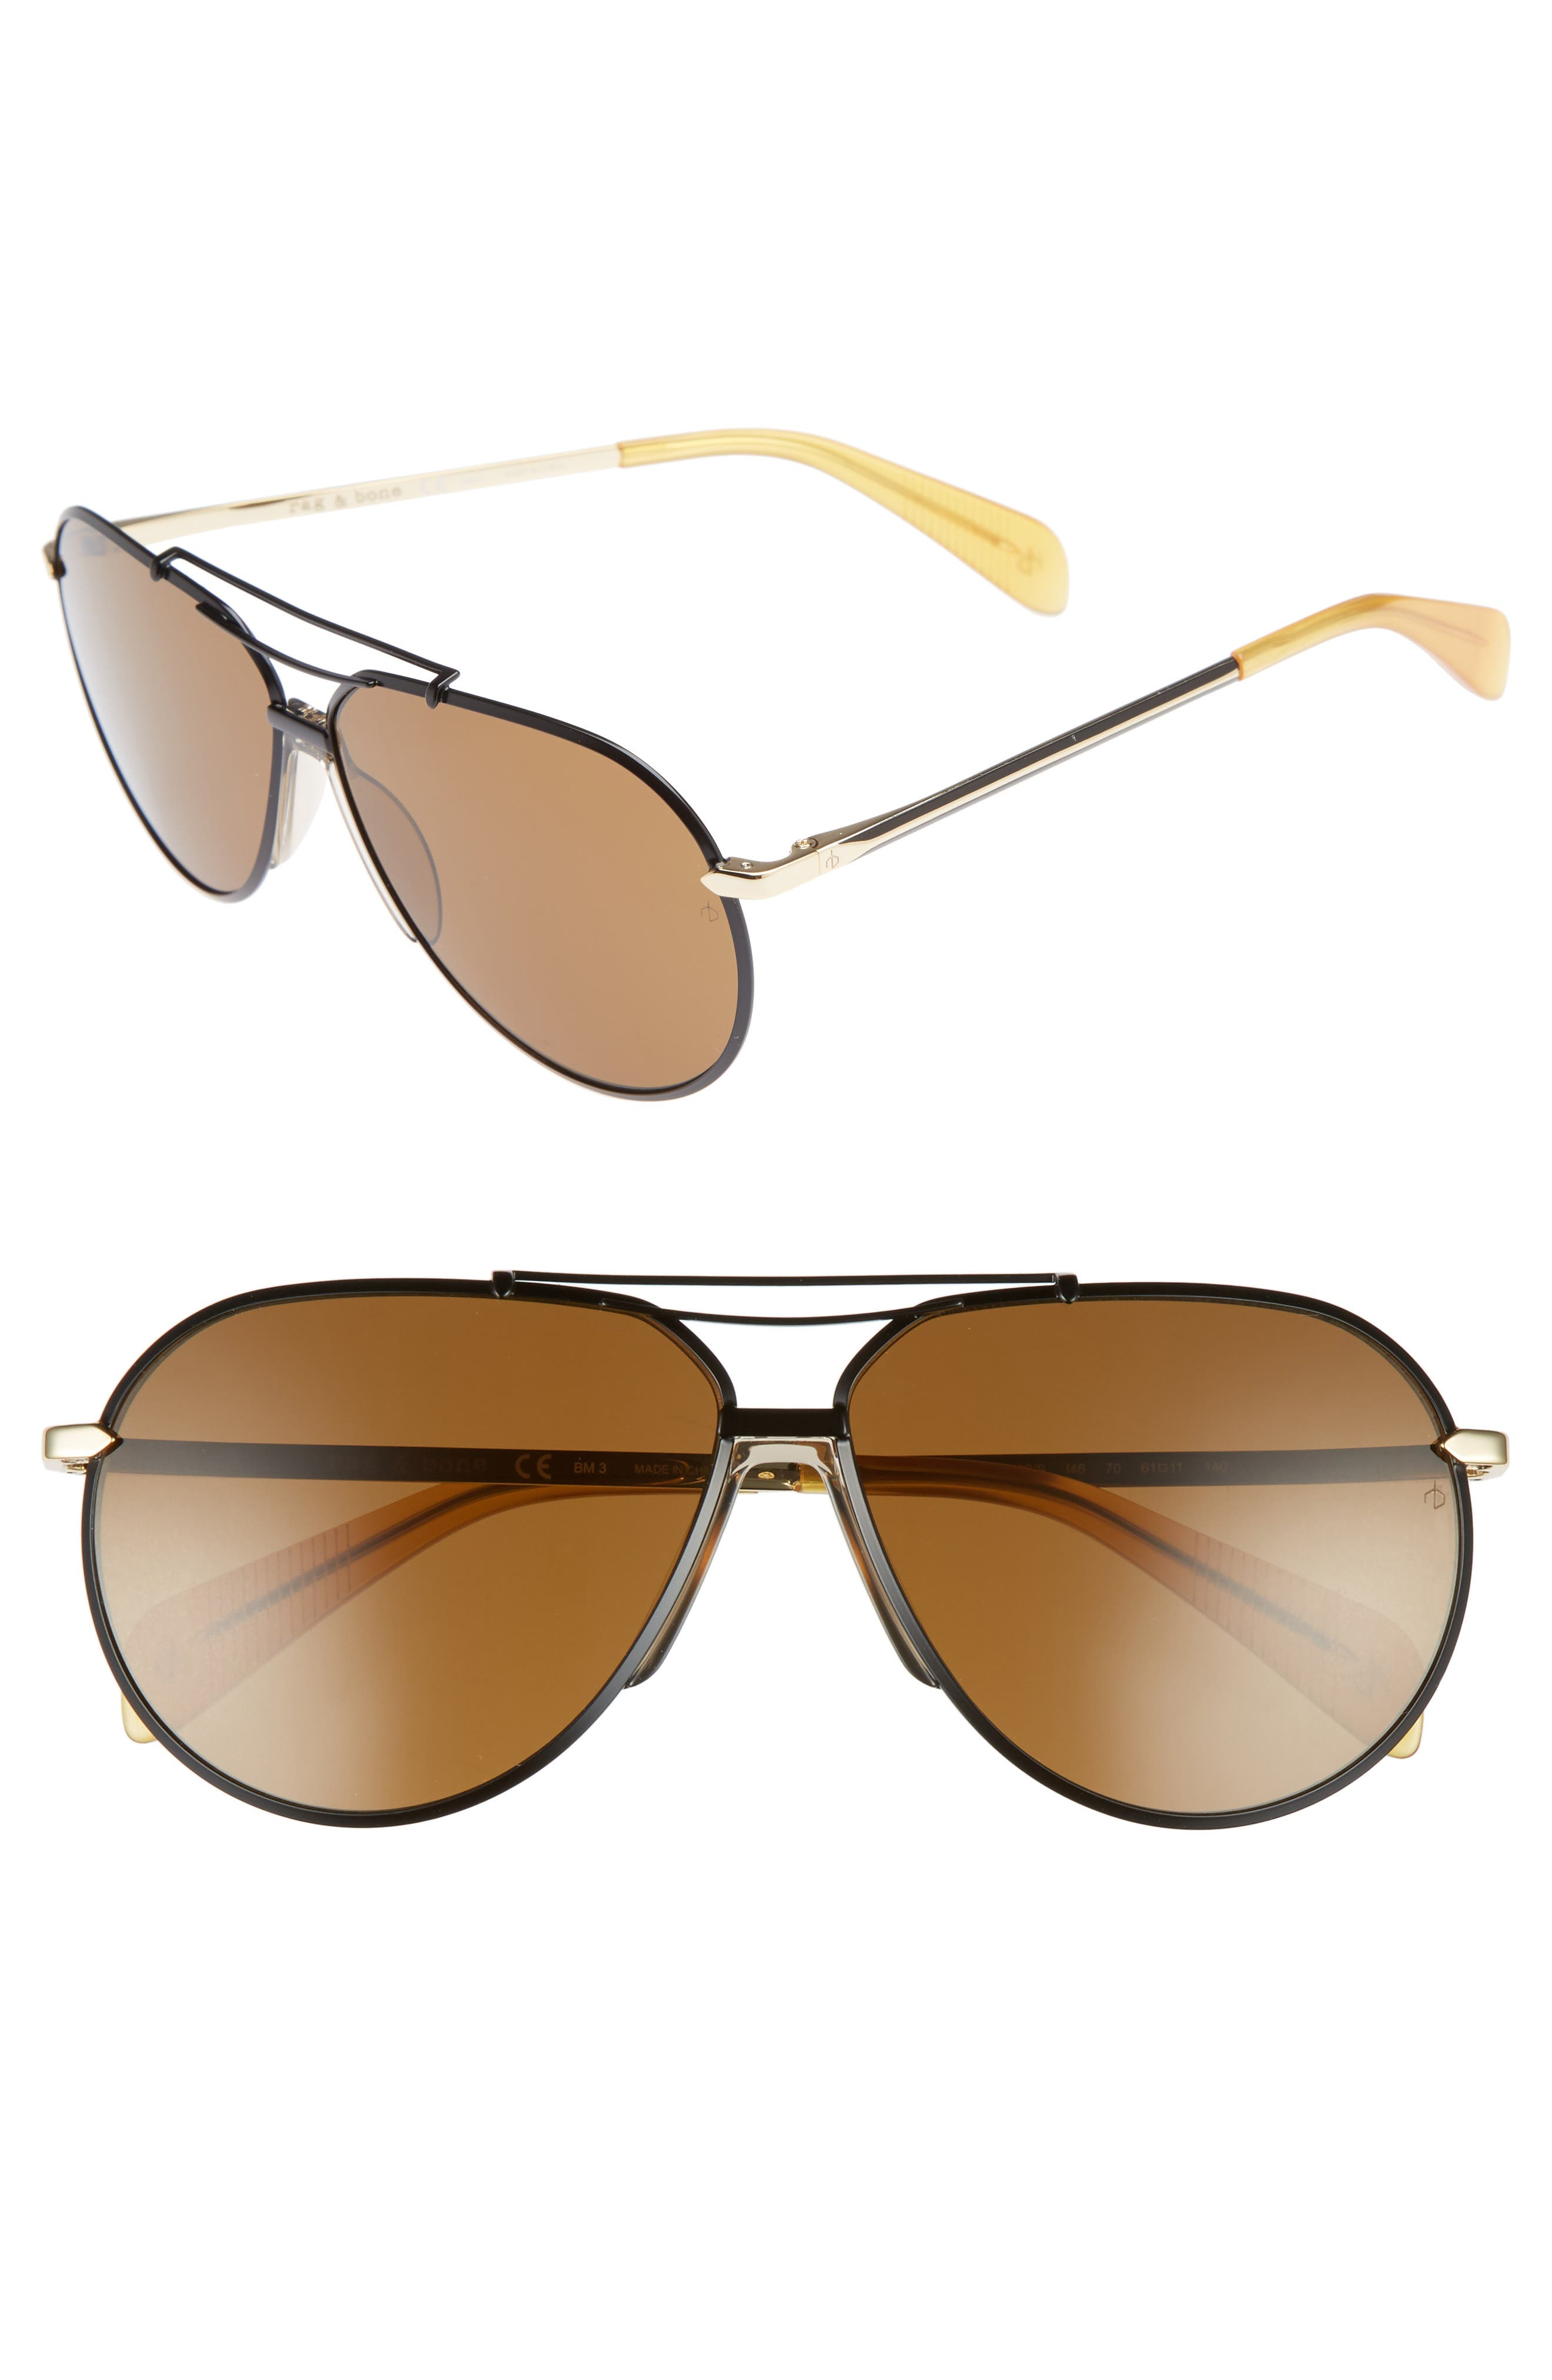 61mm Aviator Sunglasses,                             Main thumbnail 1, color,                             Black Gold